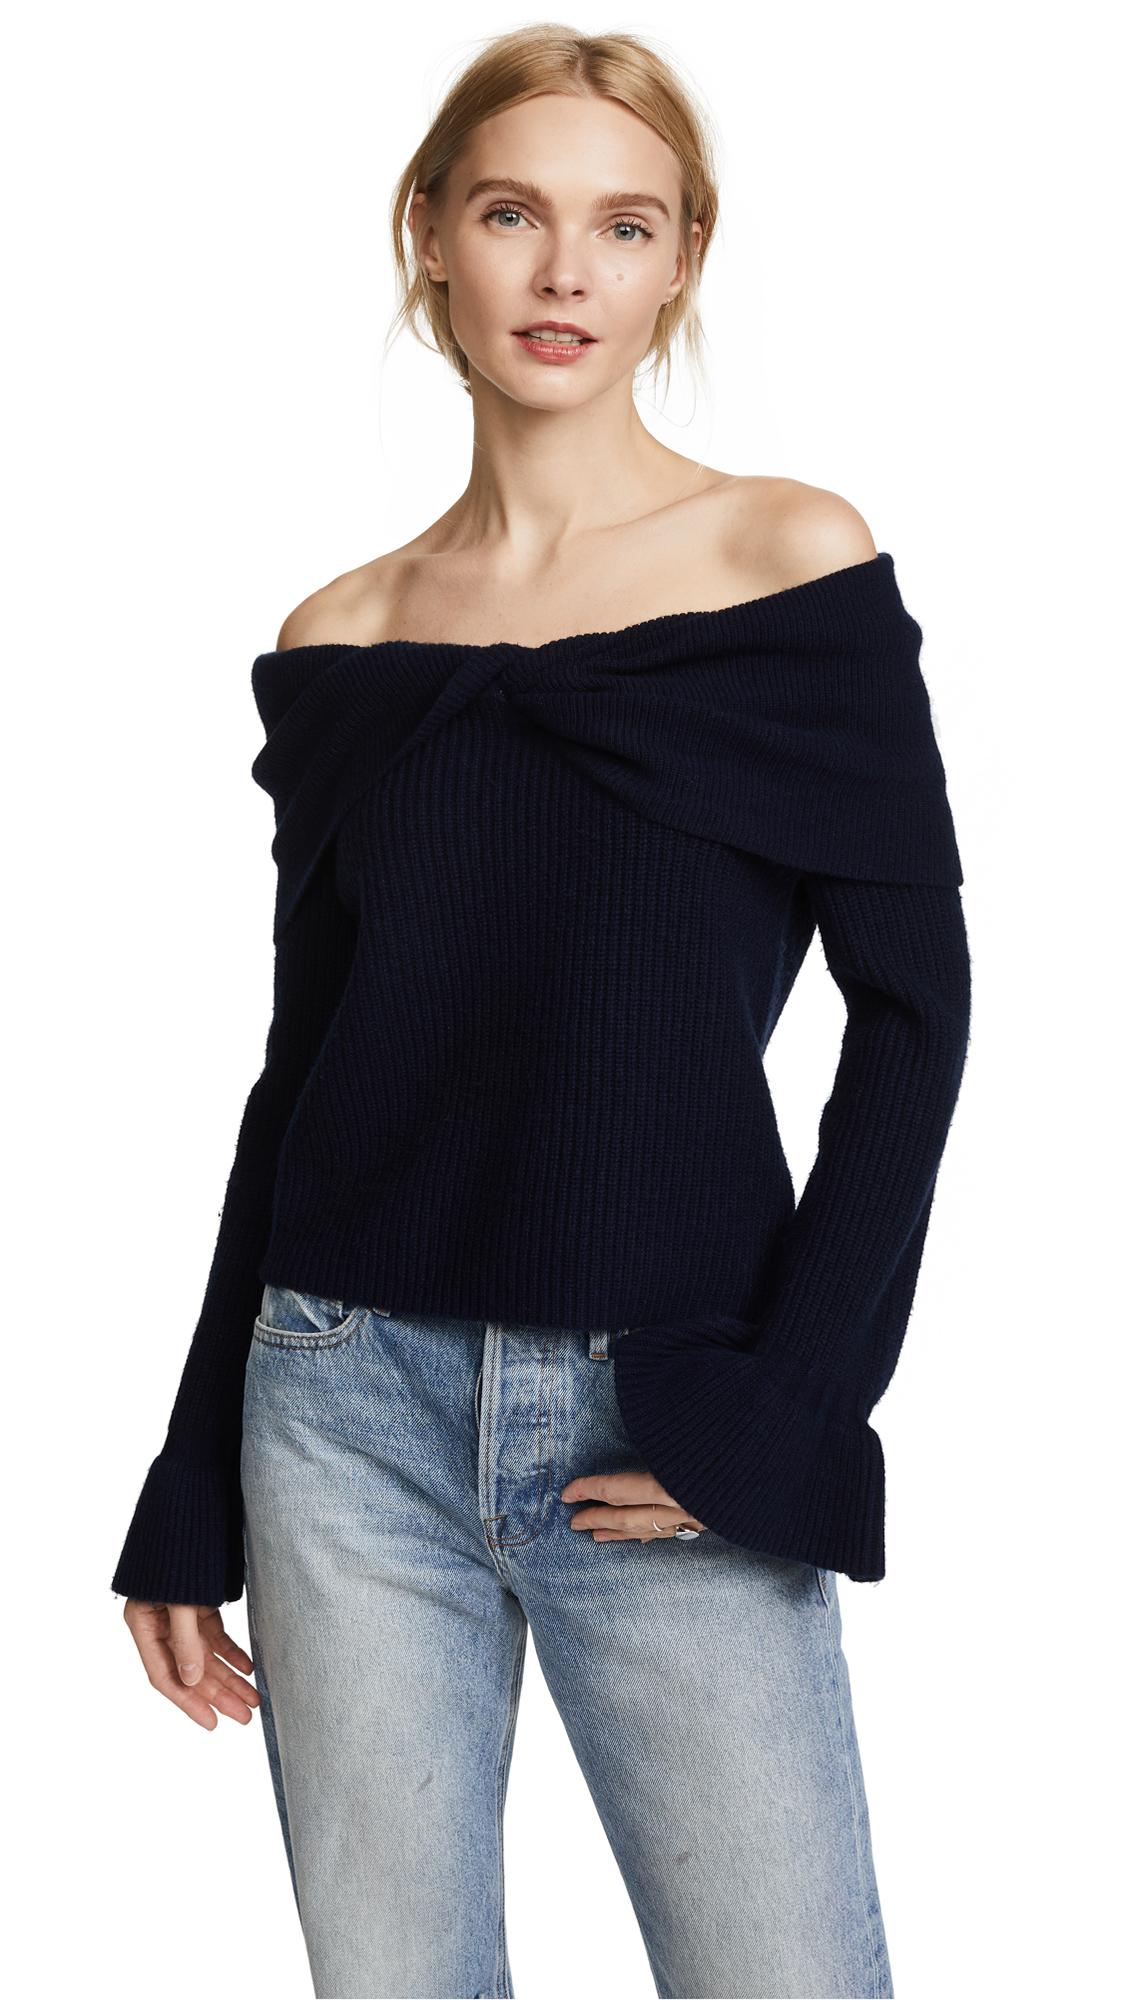 Ella Moss Jasinda Sweater - Navy